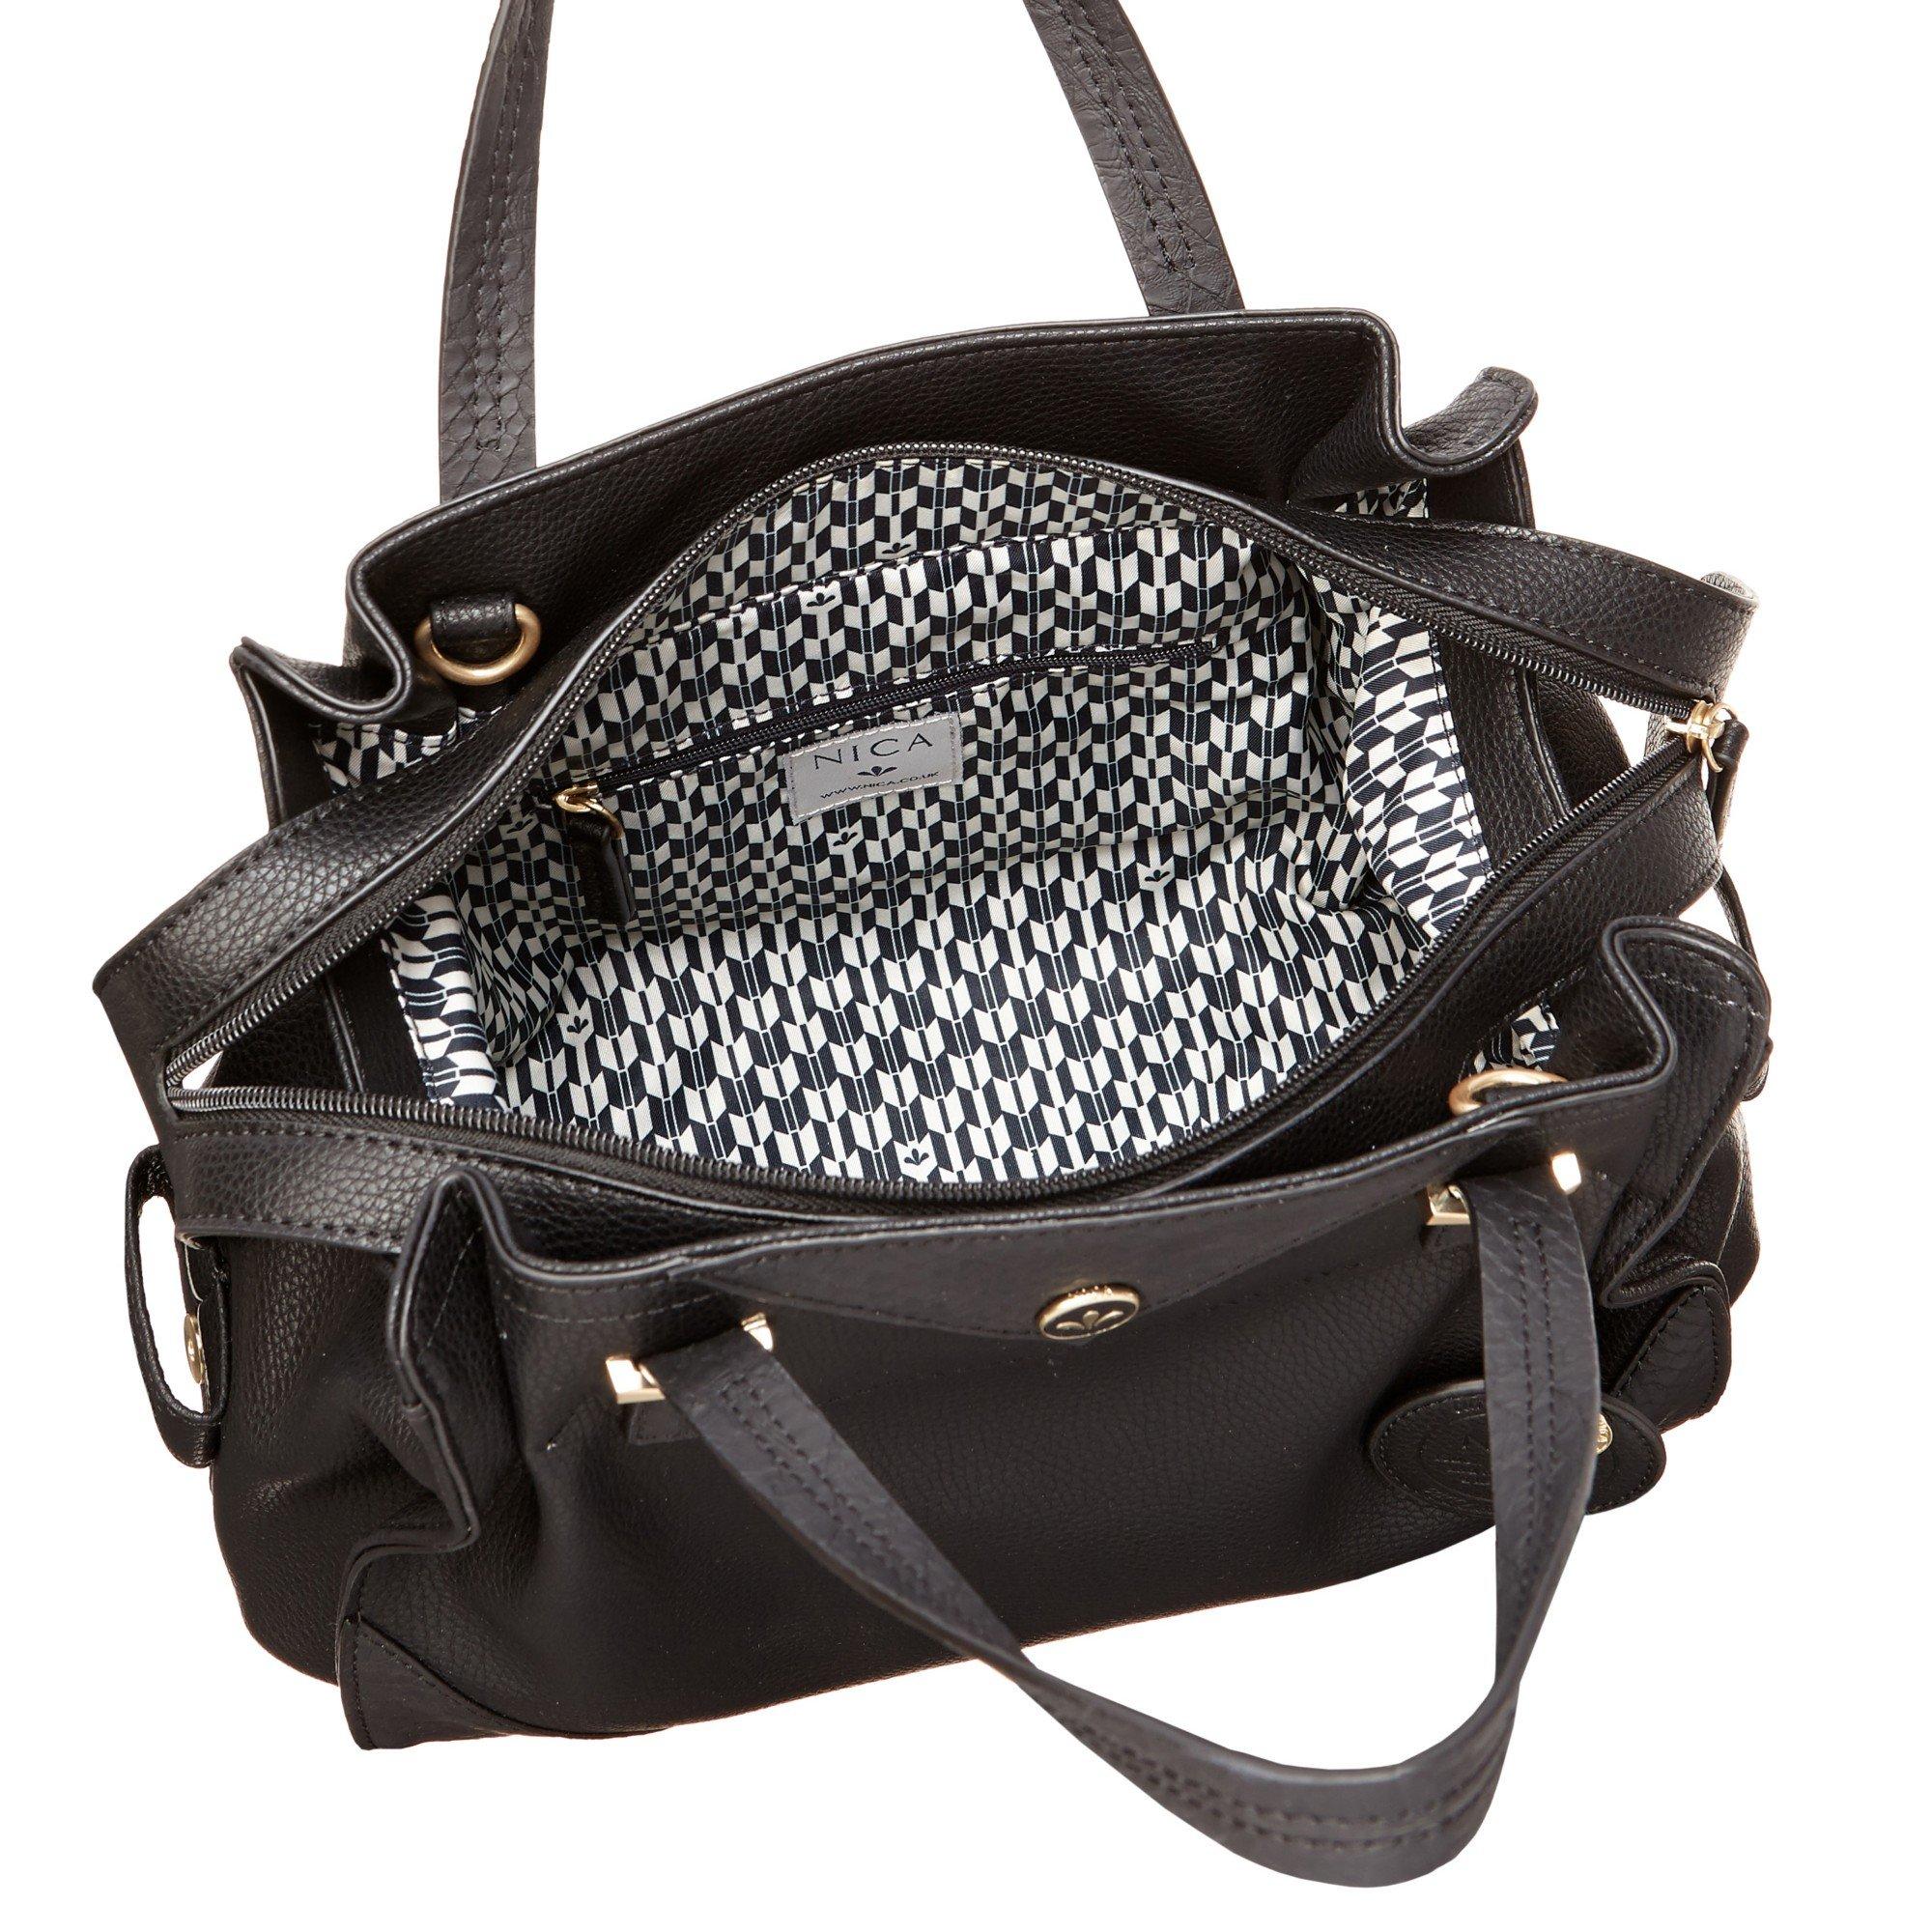 10d9cbf5360 Nica Ava Grab Bag in Black - Lyst